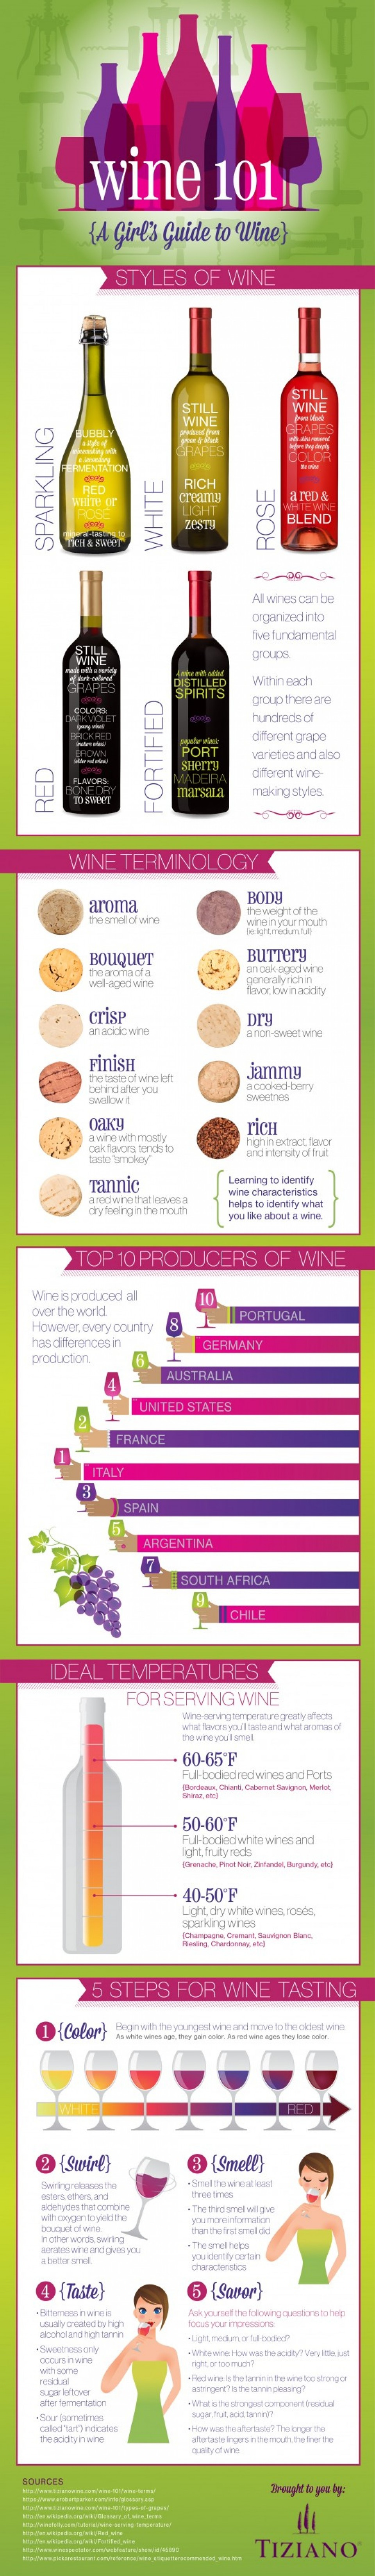 13. Styles of Wines